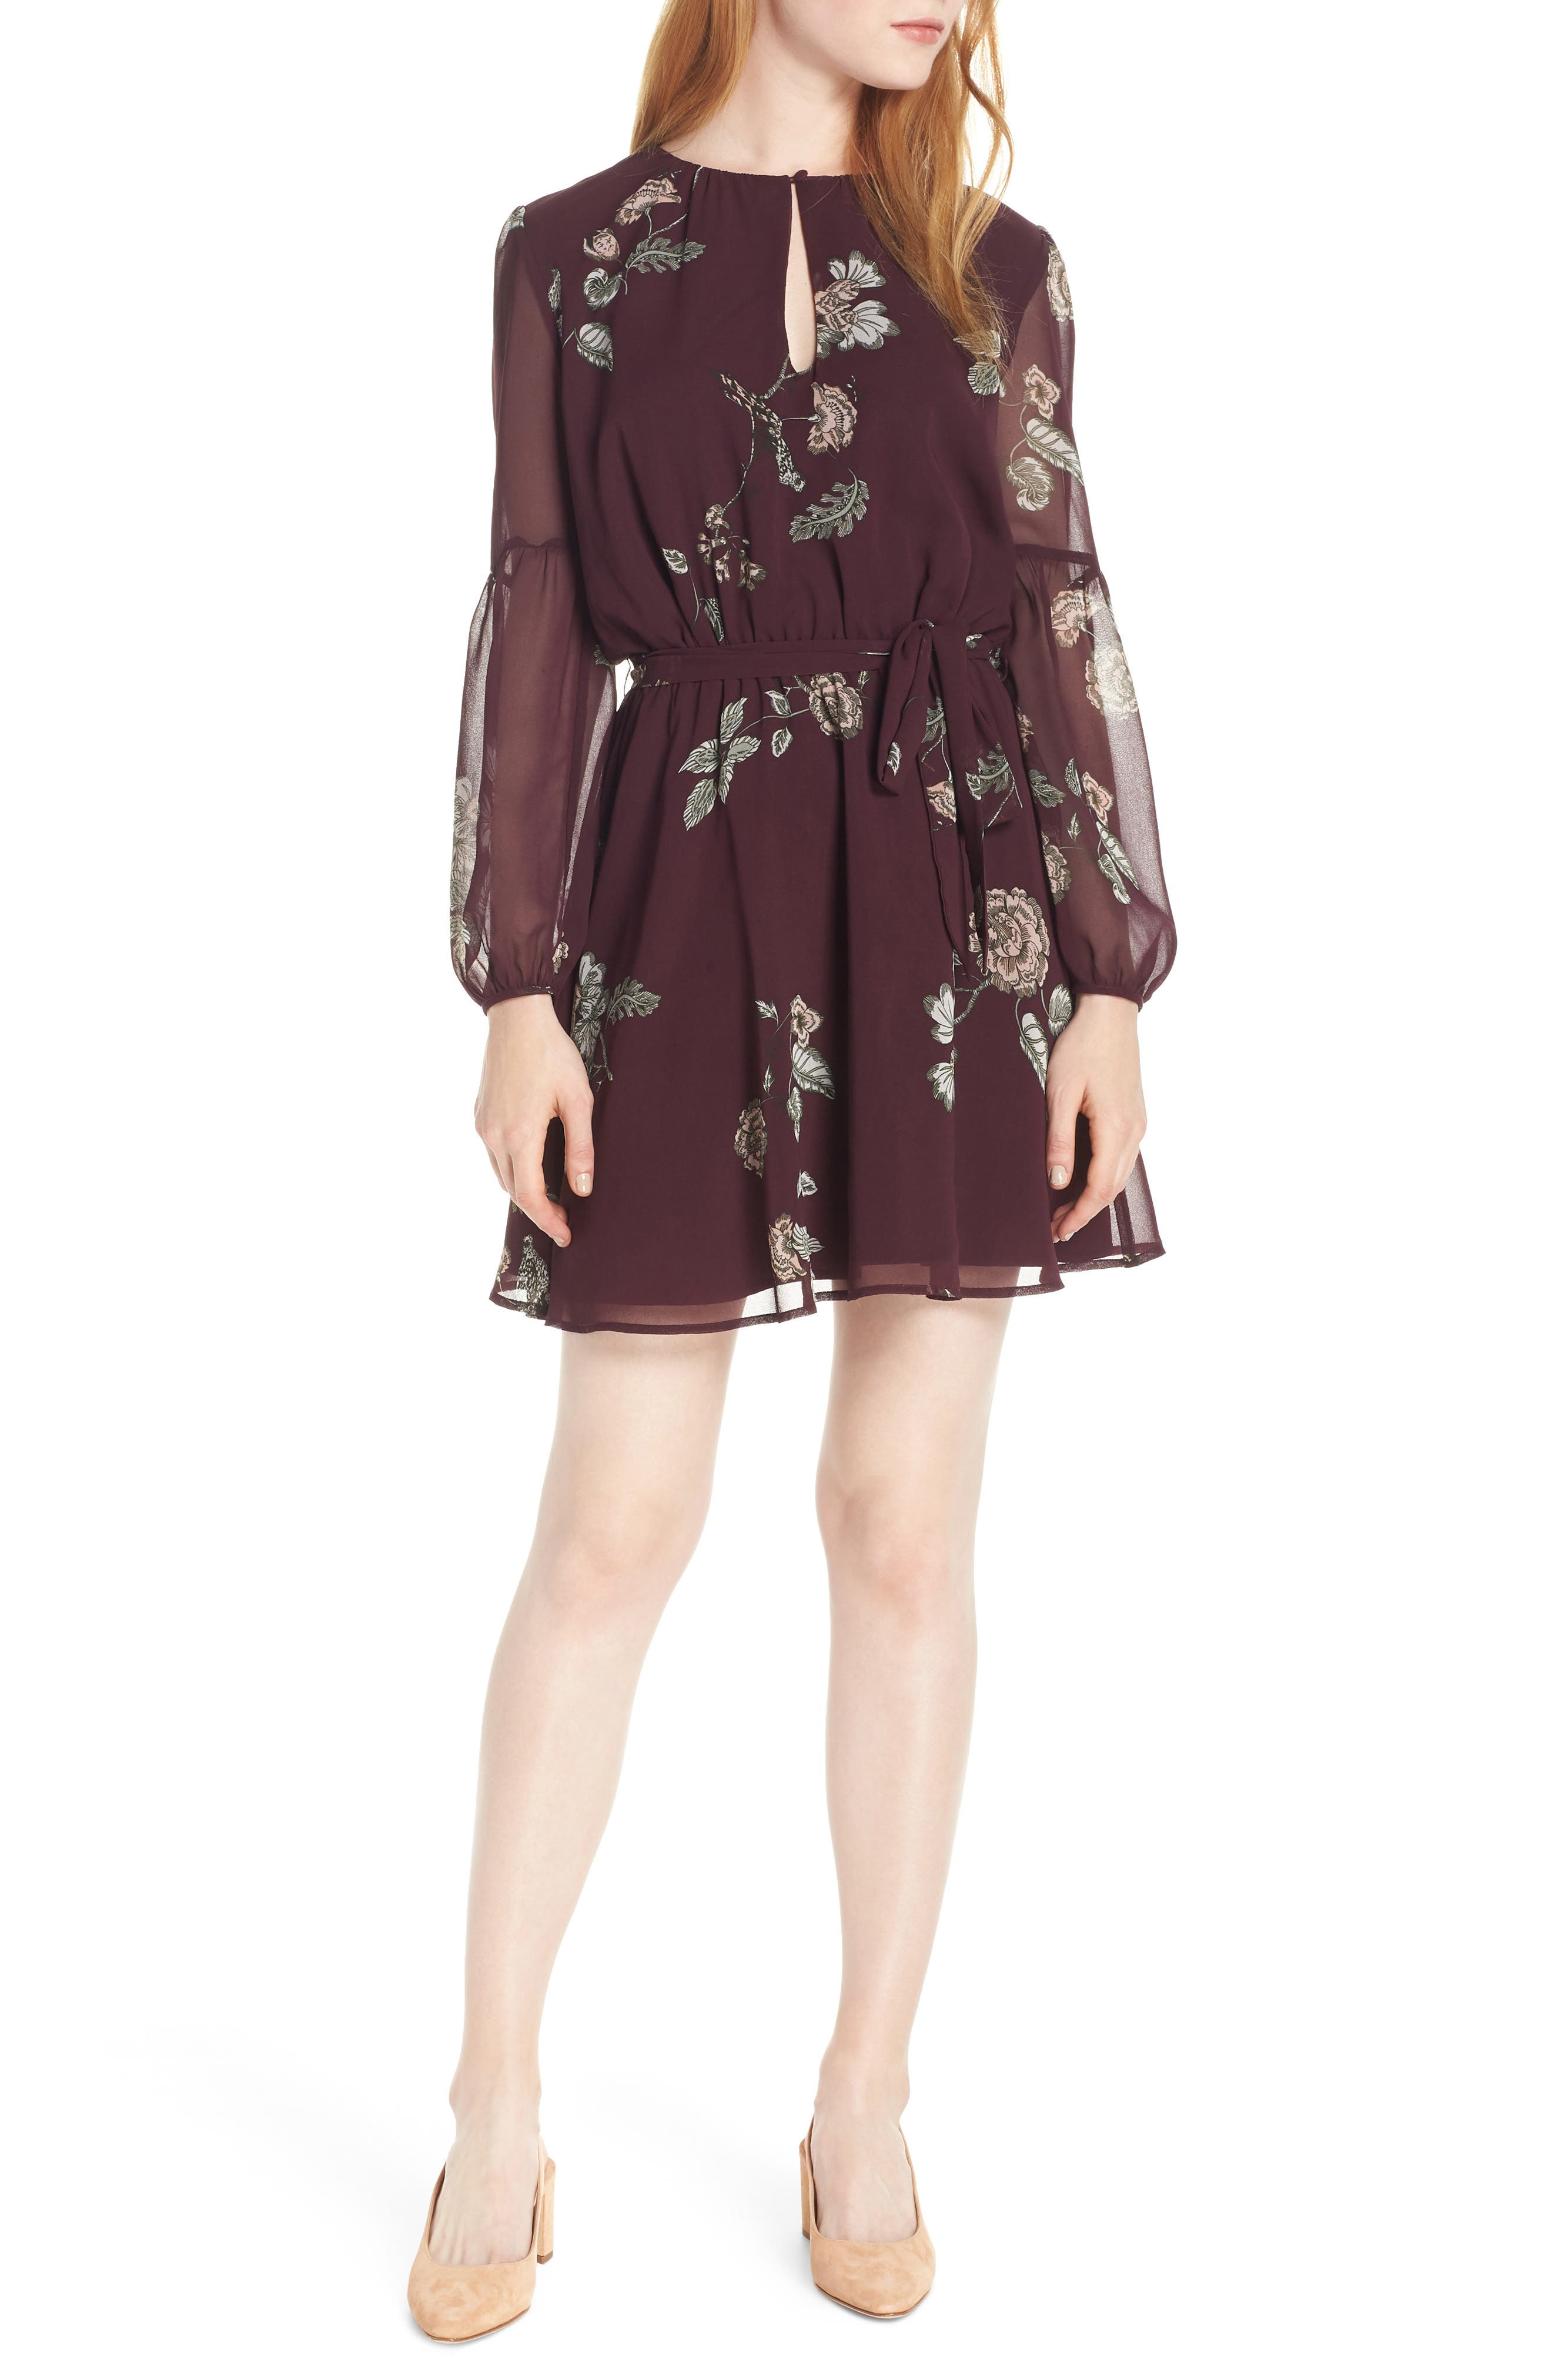 Bb Dakota Winter Rose Chiffon Dress, Burgundy